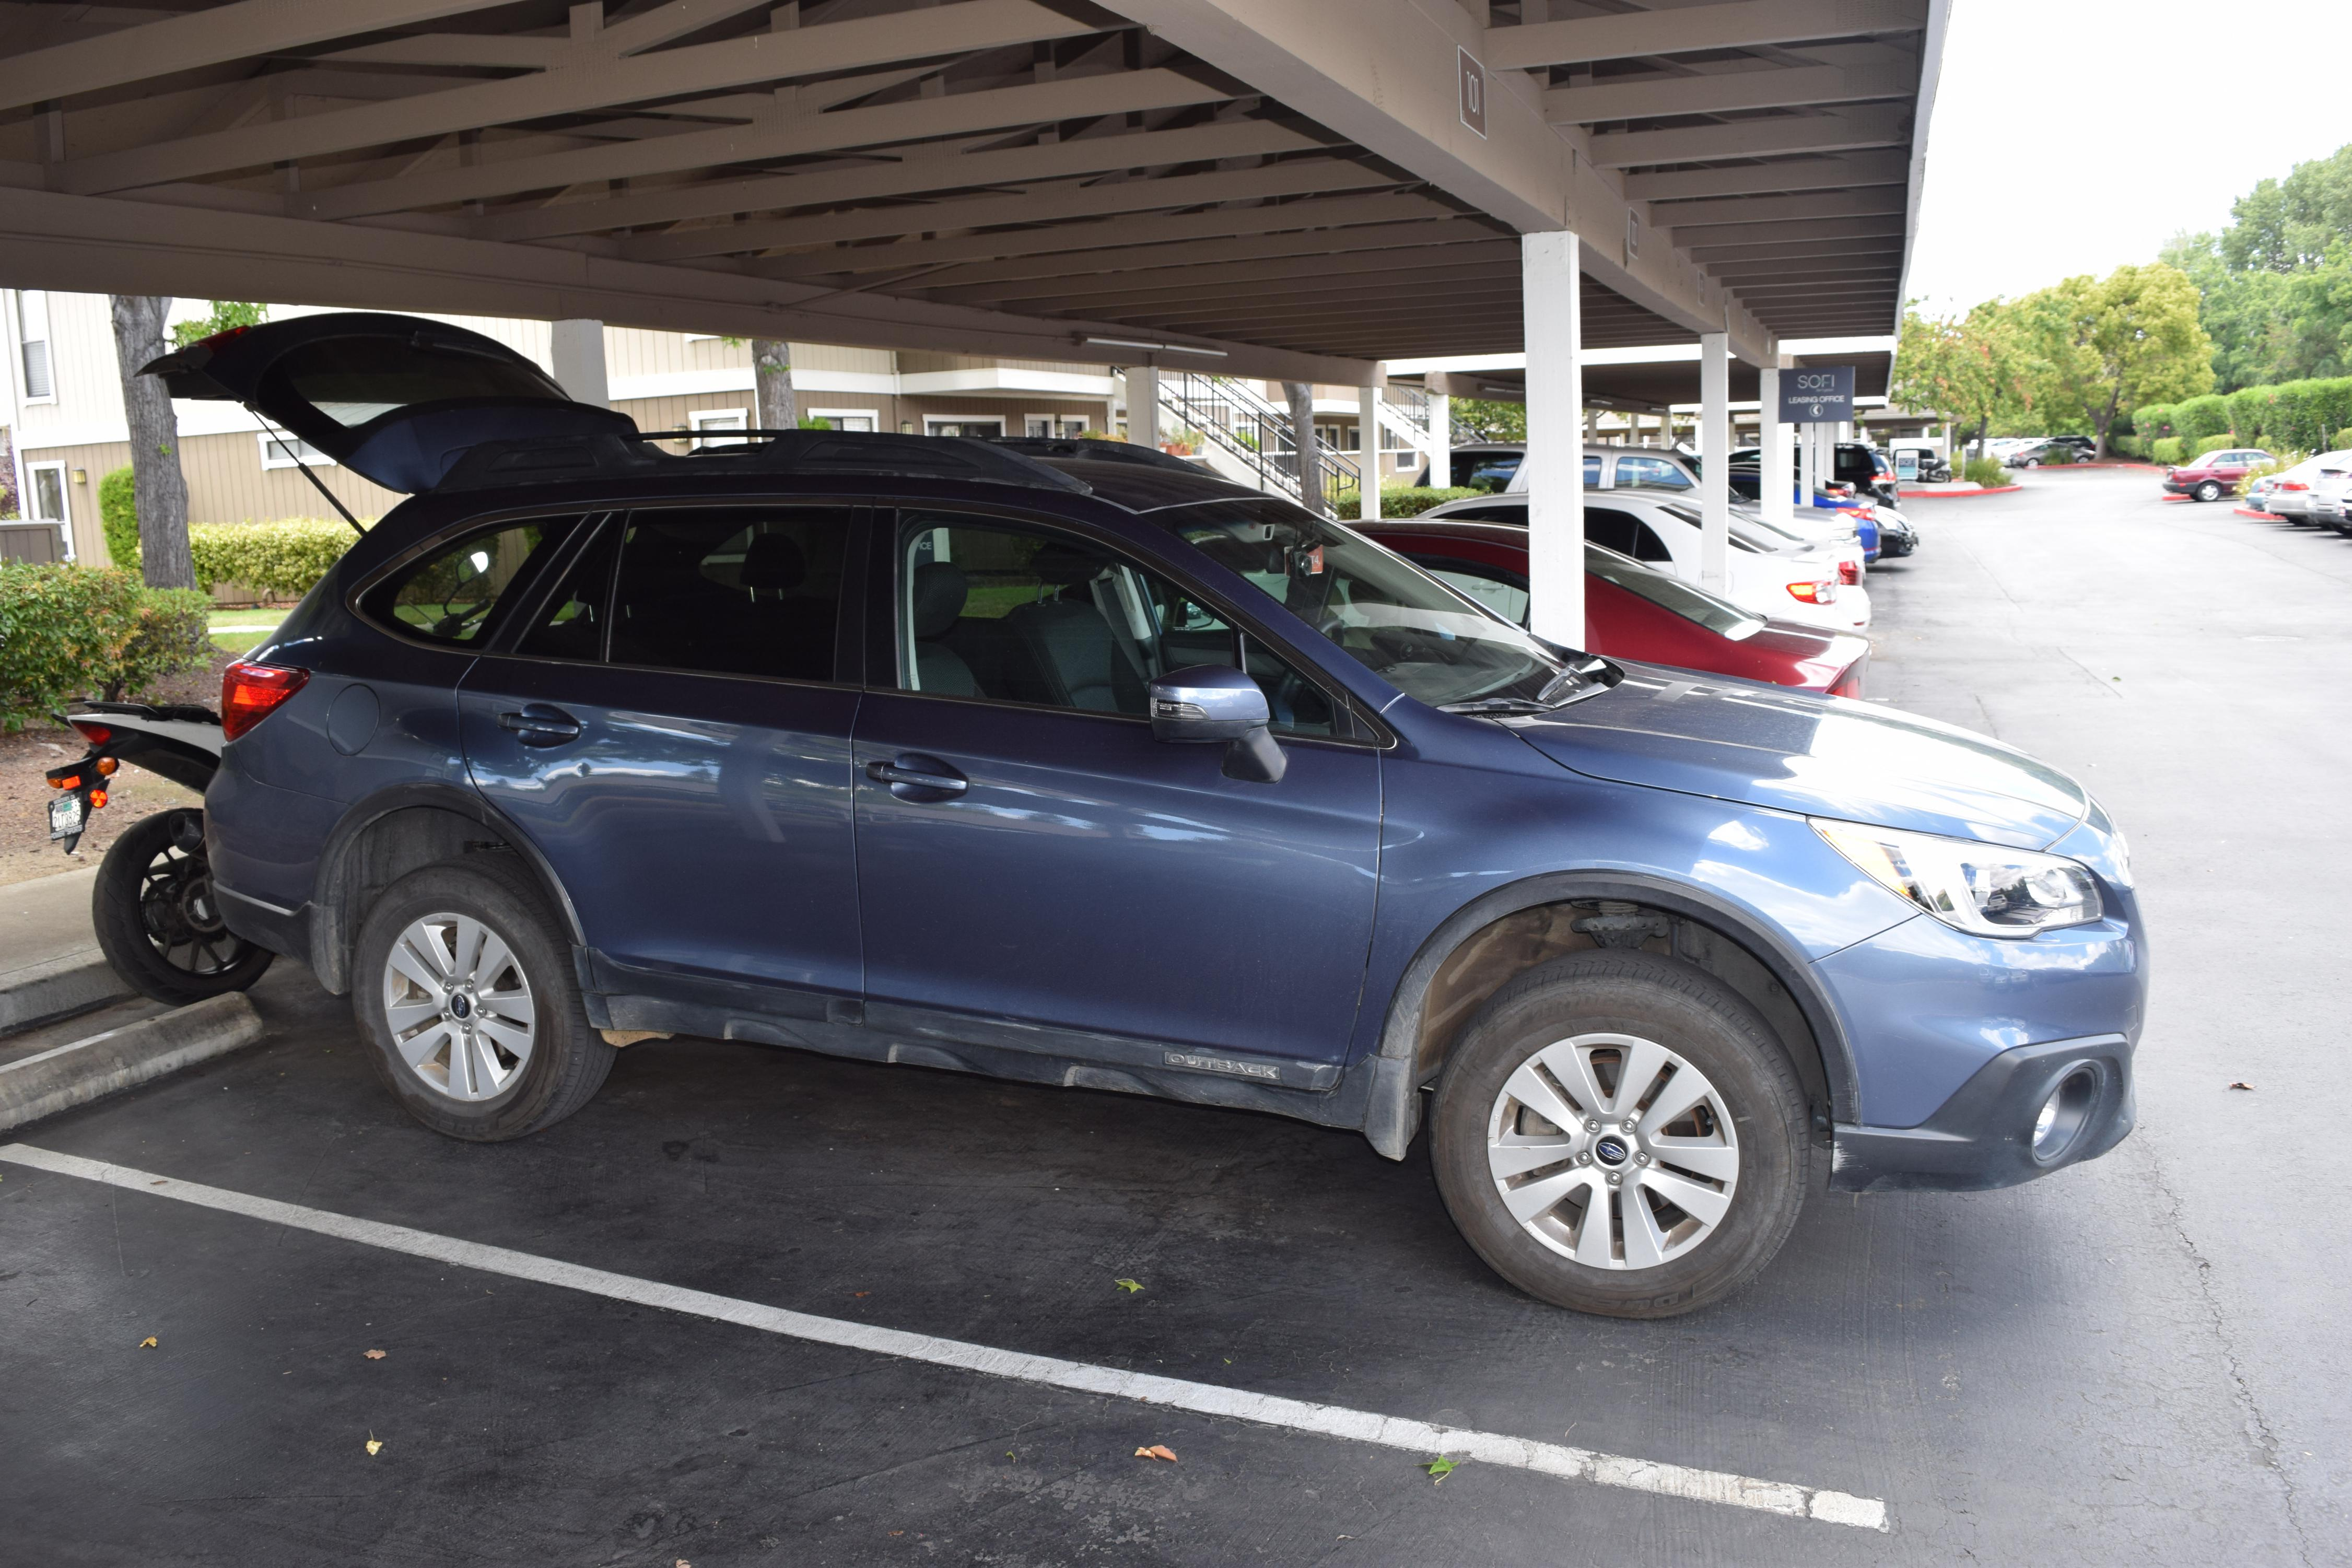 Subaru Outback Off Road >> ATTENTION: subaru lift kit problem - Subaru Outback - Subaru Outback Forums